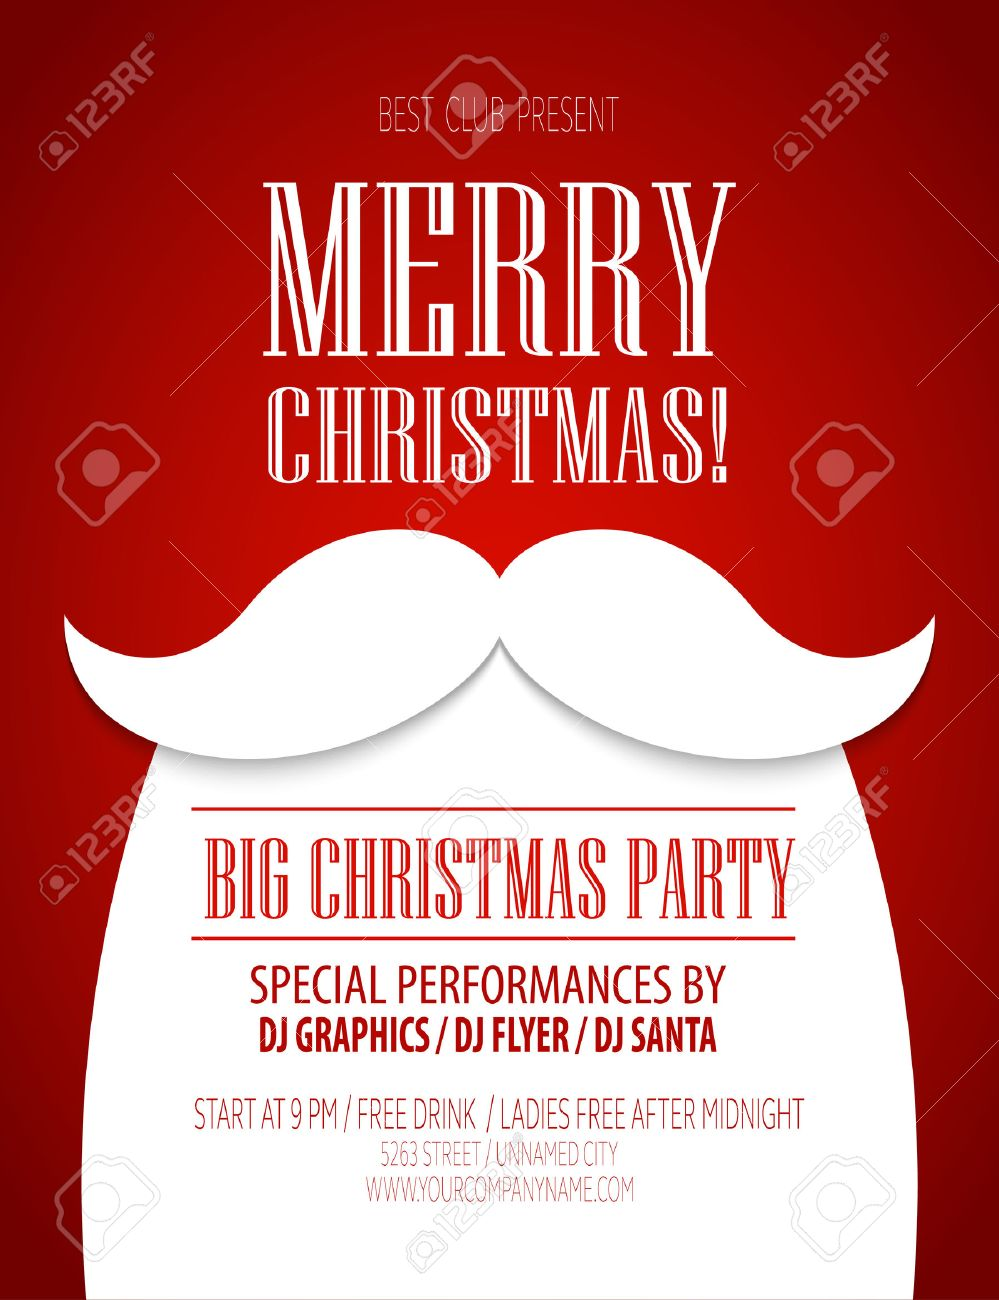 Christmas Party Poster.Christmas Party Poster